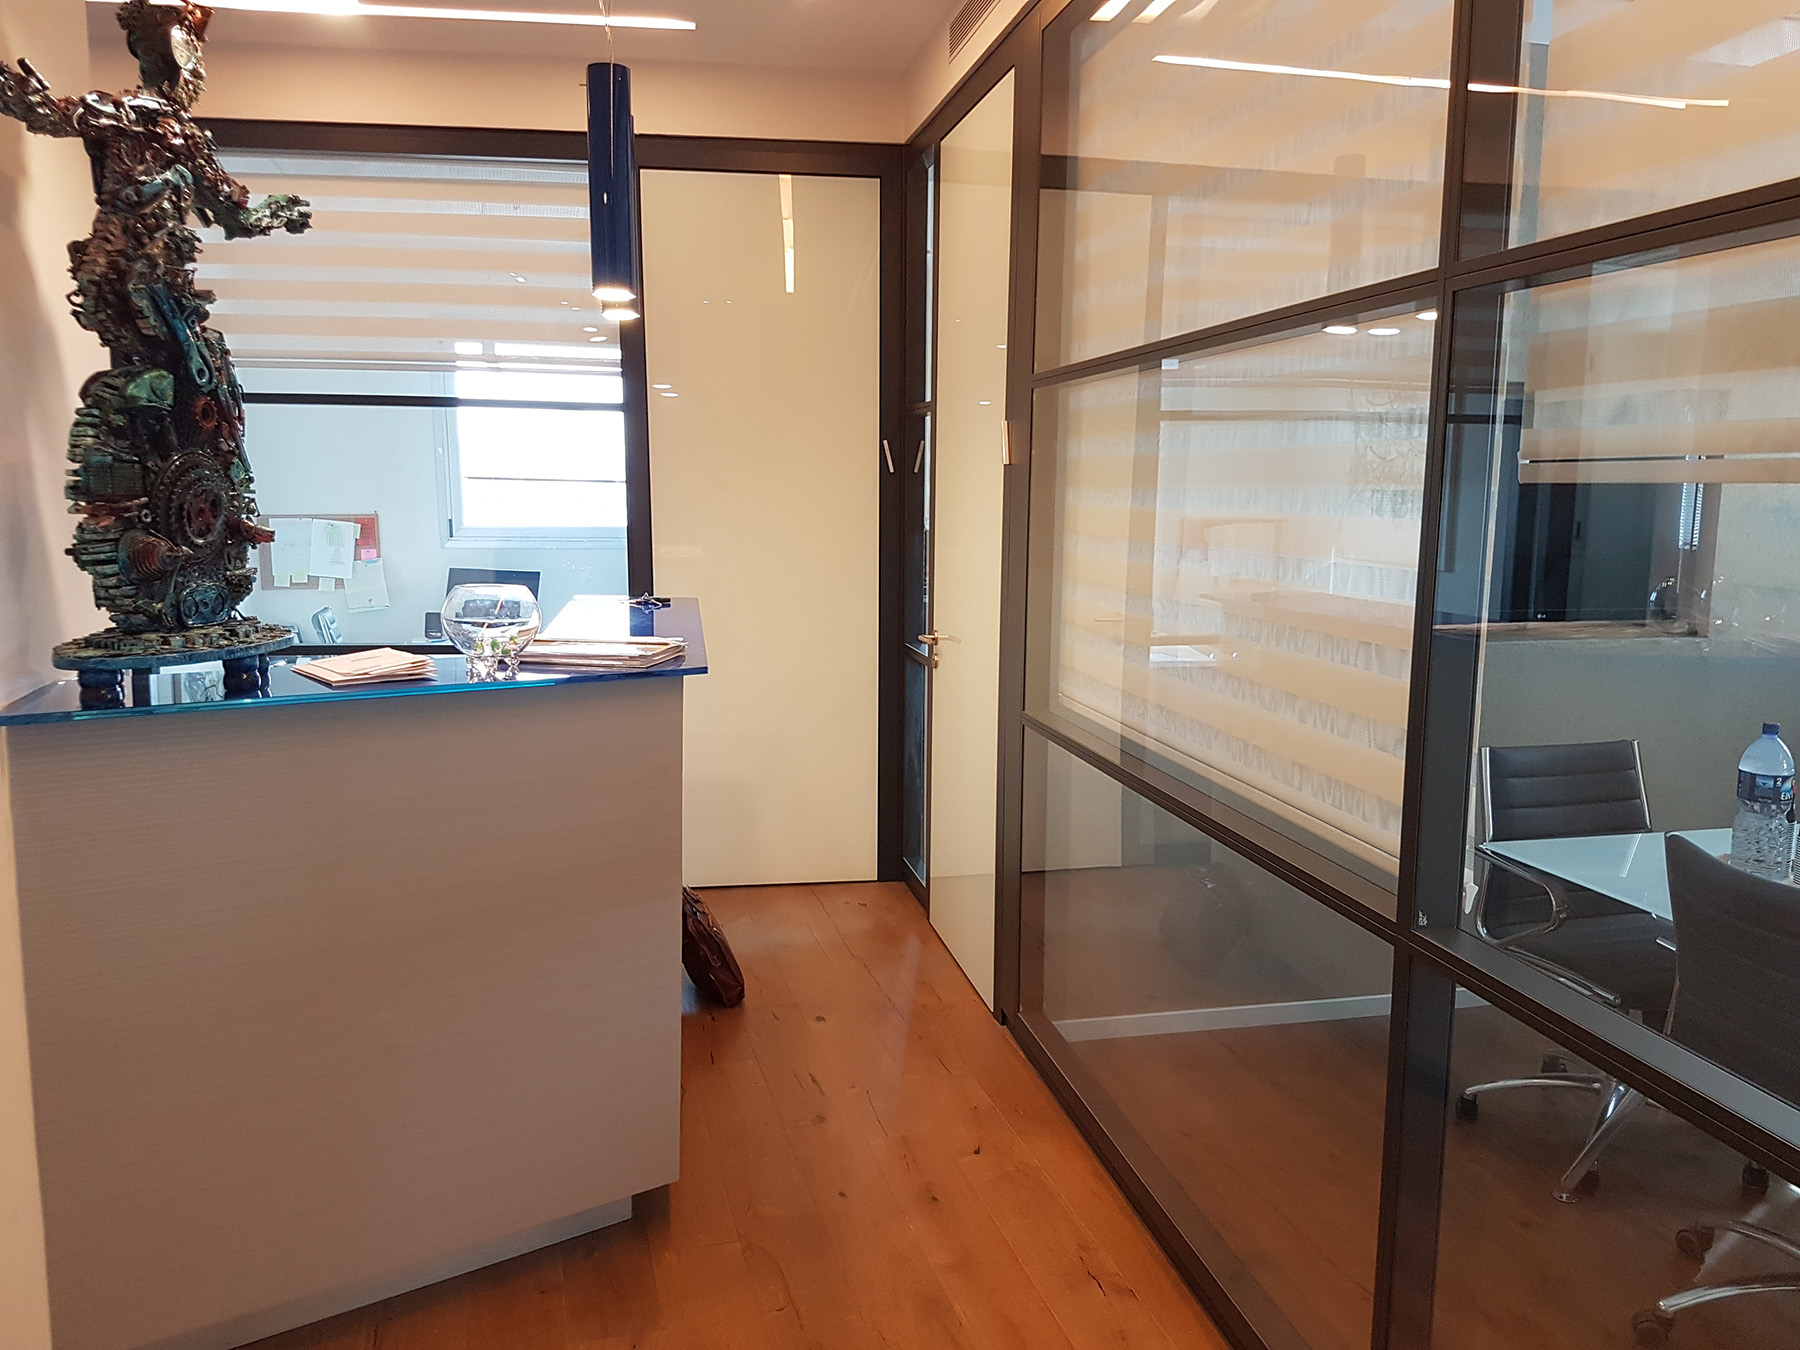 עורך דין עסקי | עורך דין מסחרי | משרד עו